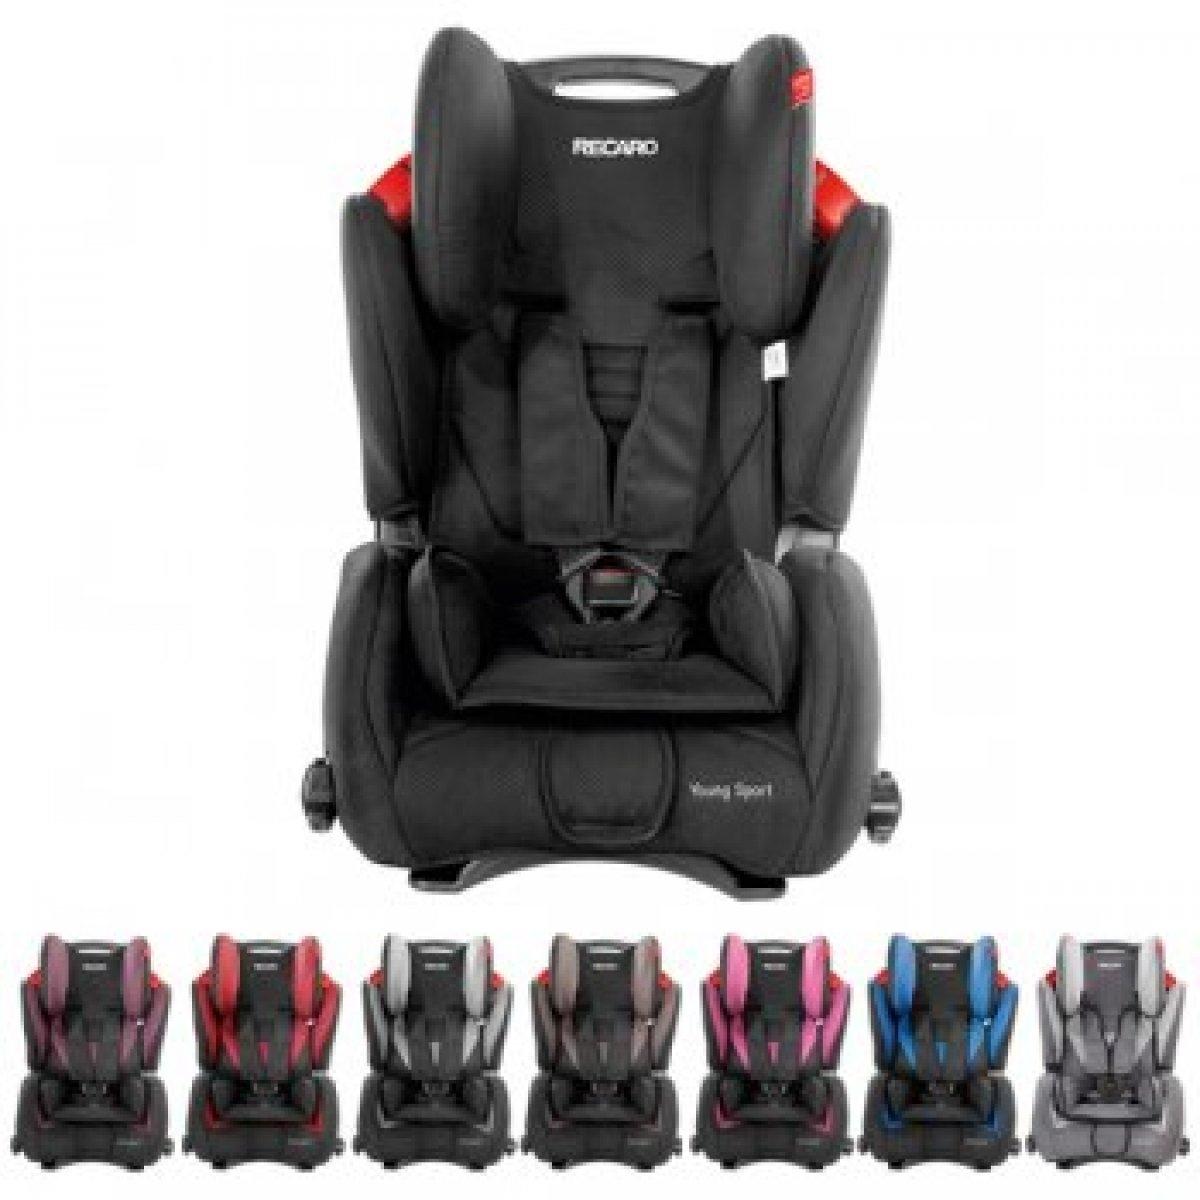 RECARO-Kinderautositz-YOUNG-SPORT-9-36-kg-Design-2014-waehlbar-NEU-7967